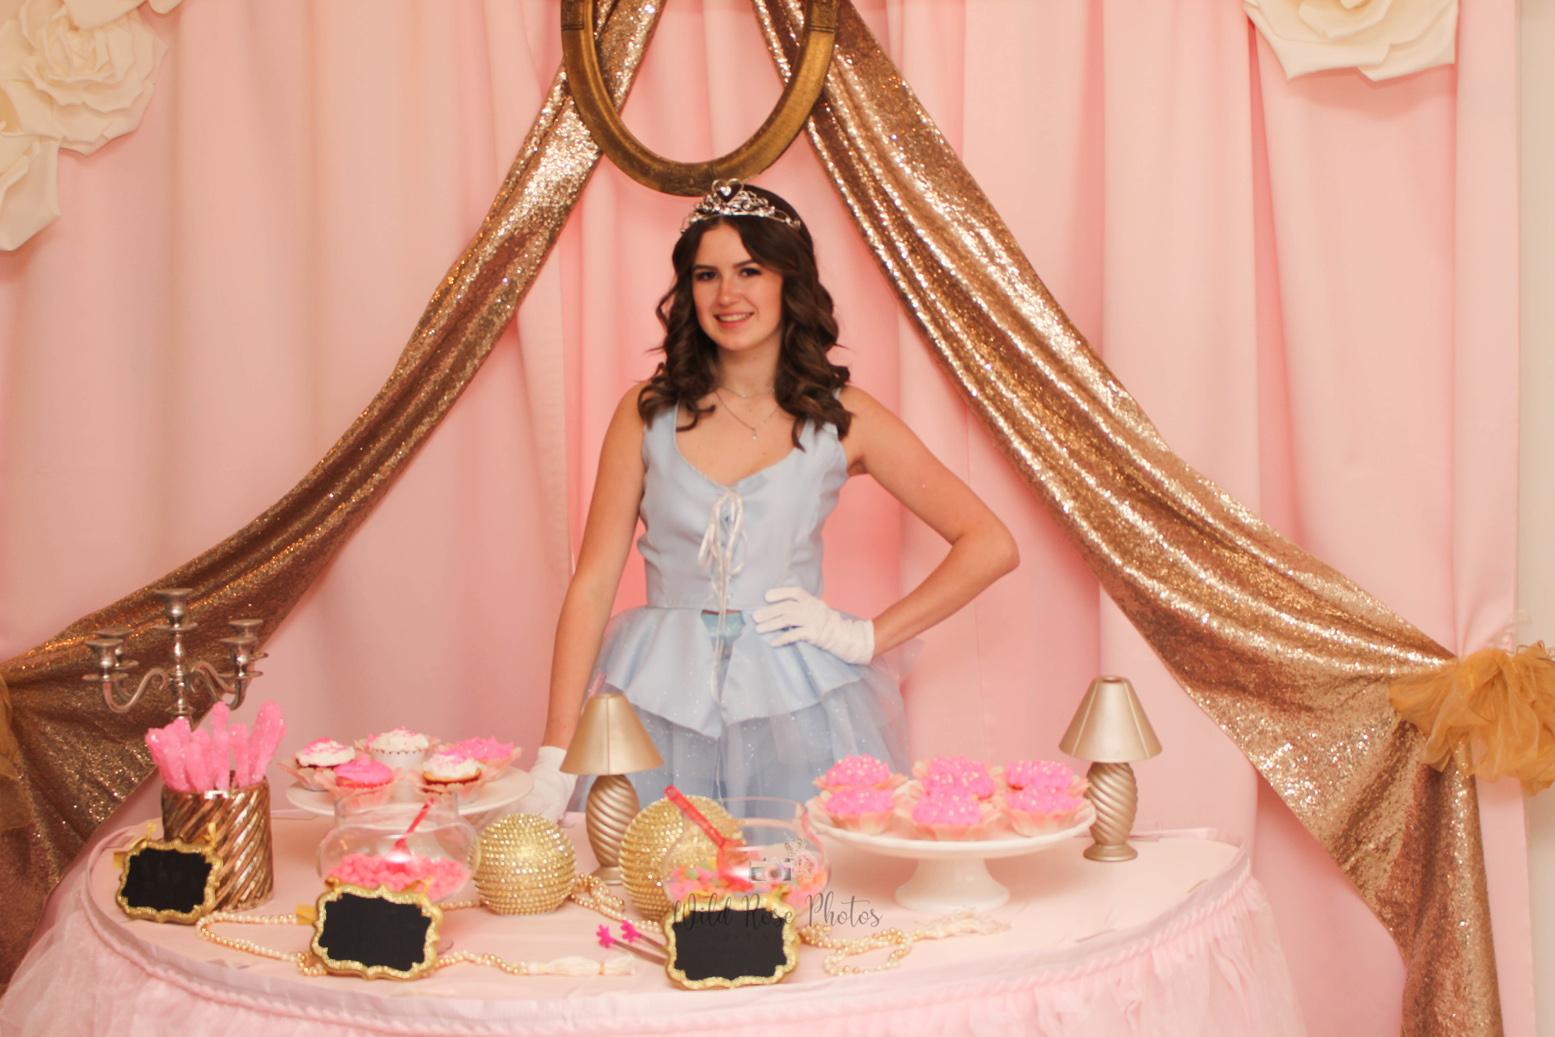 Princess-Party-5-web.jpg